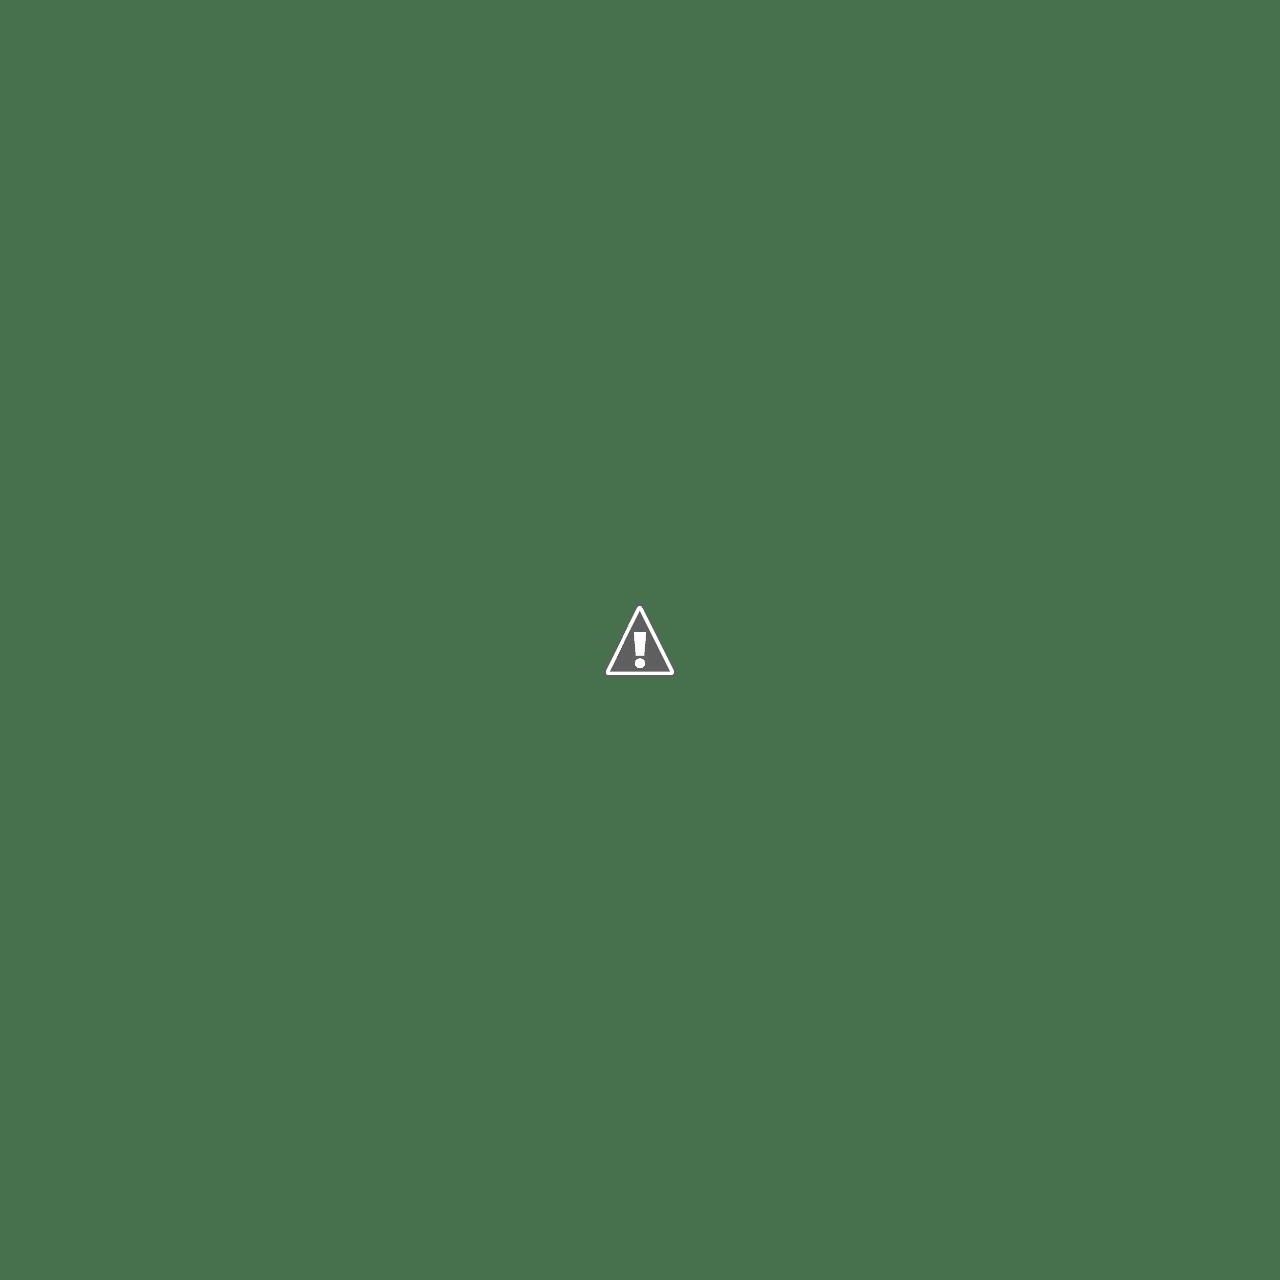 Sewa Tenda Depok 08119408889 Sewa Tenda Di Depok Menyewakan Tenda Kursi Meja Panggung Karpet Ac Portable Sound System